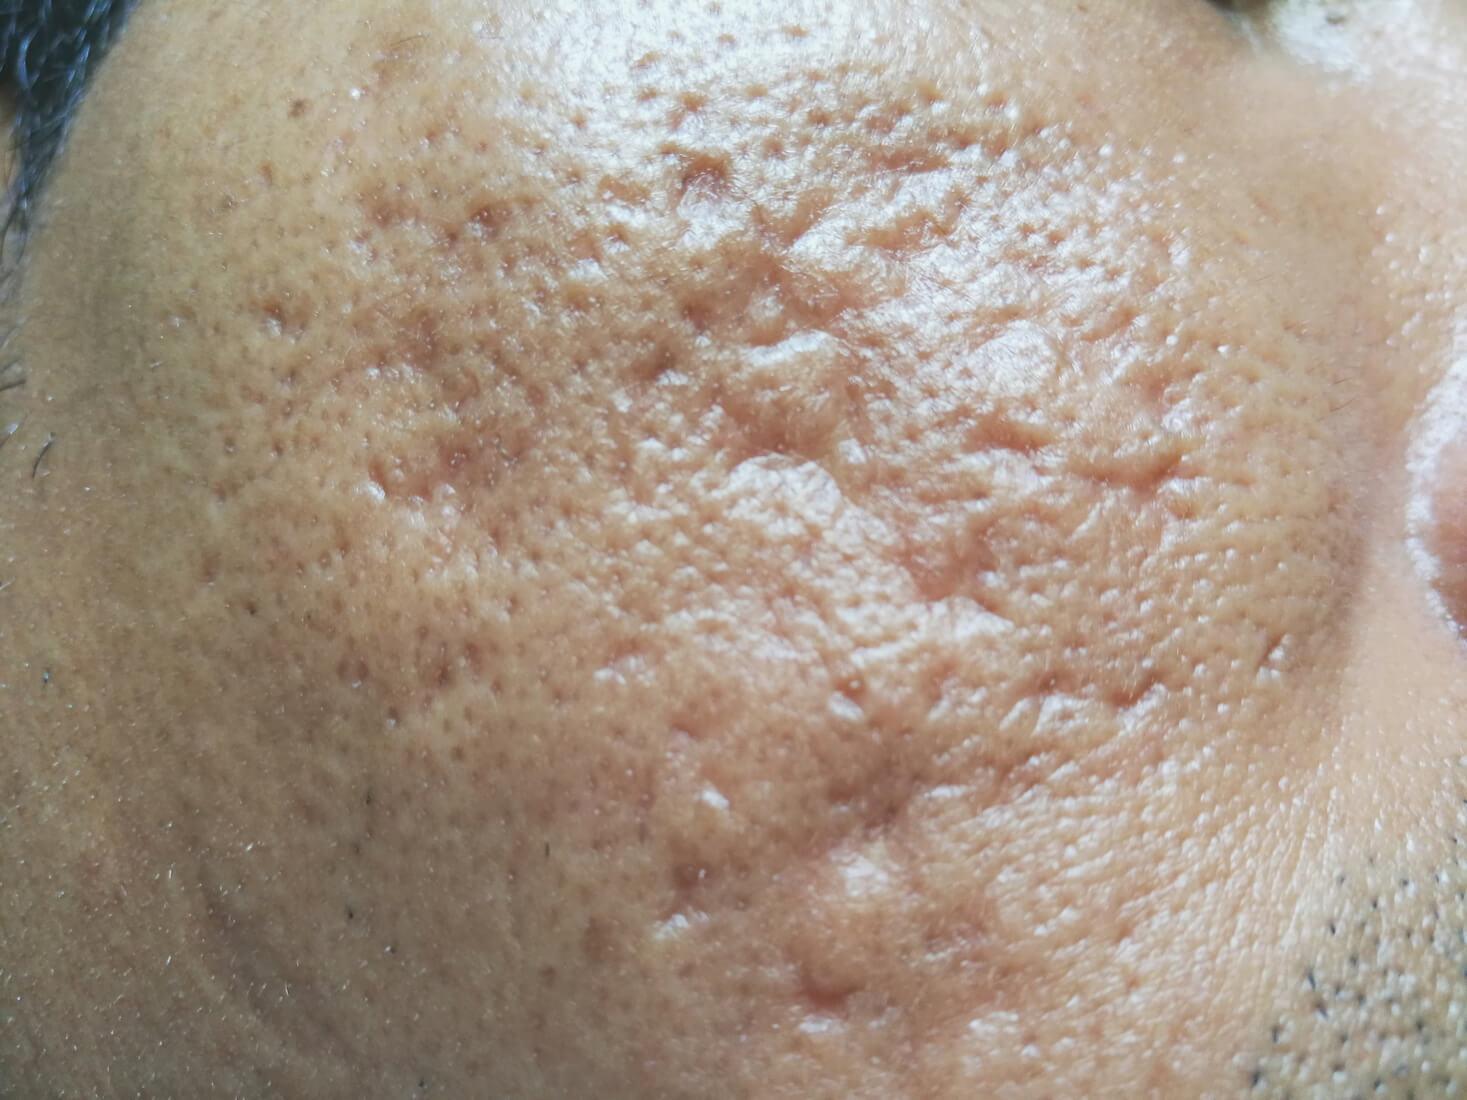 tca cross acne scars in Singapore